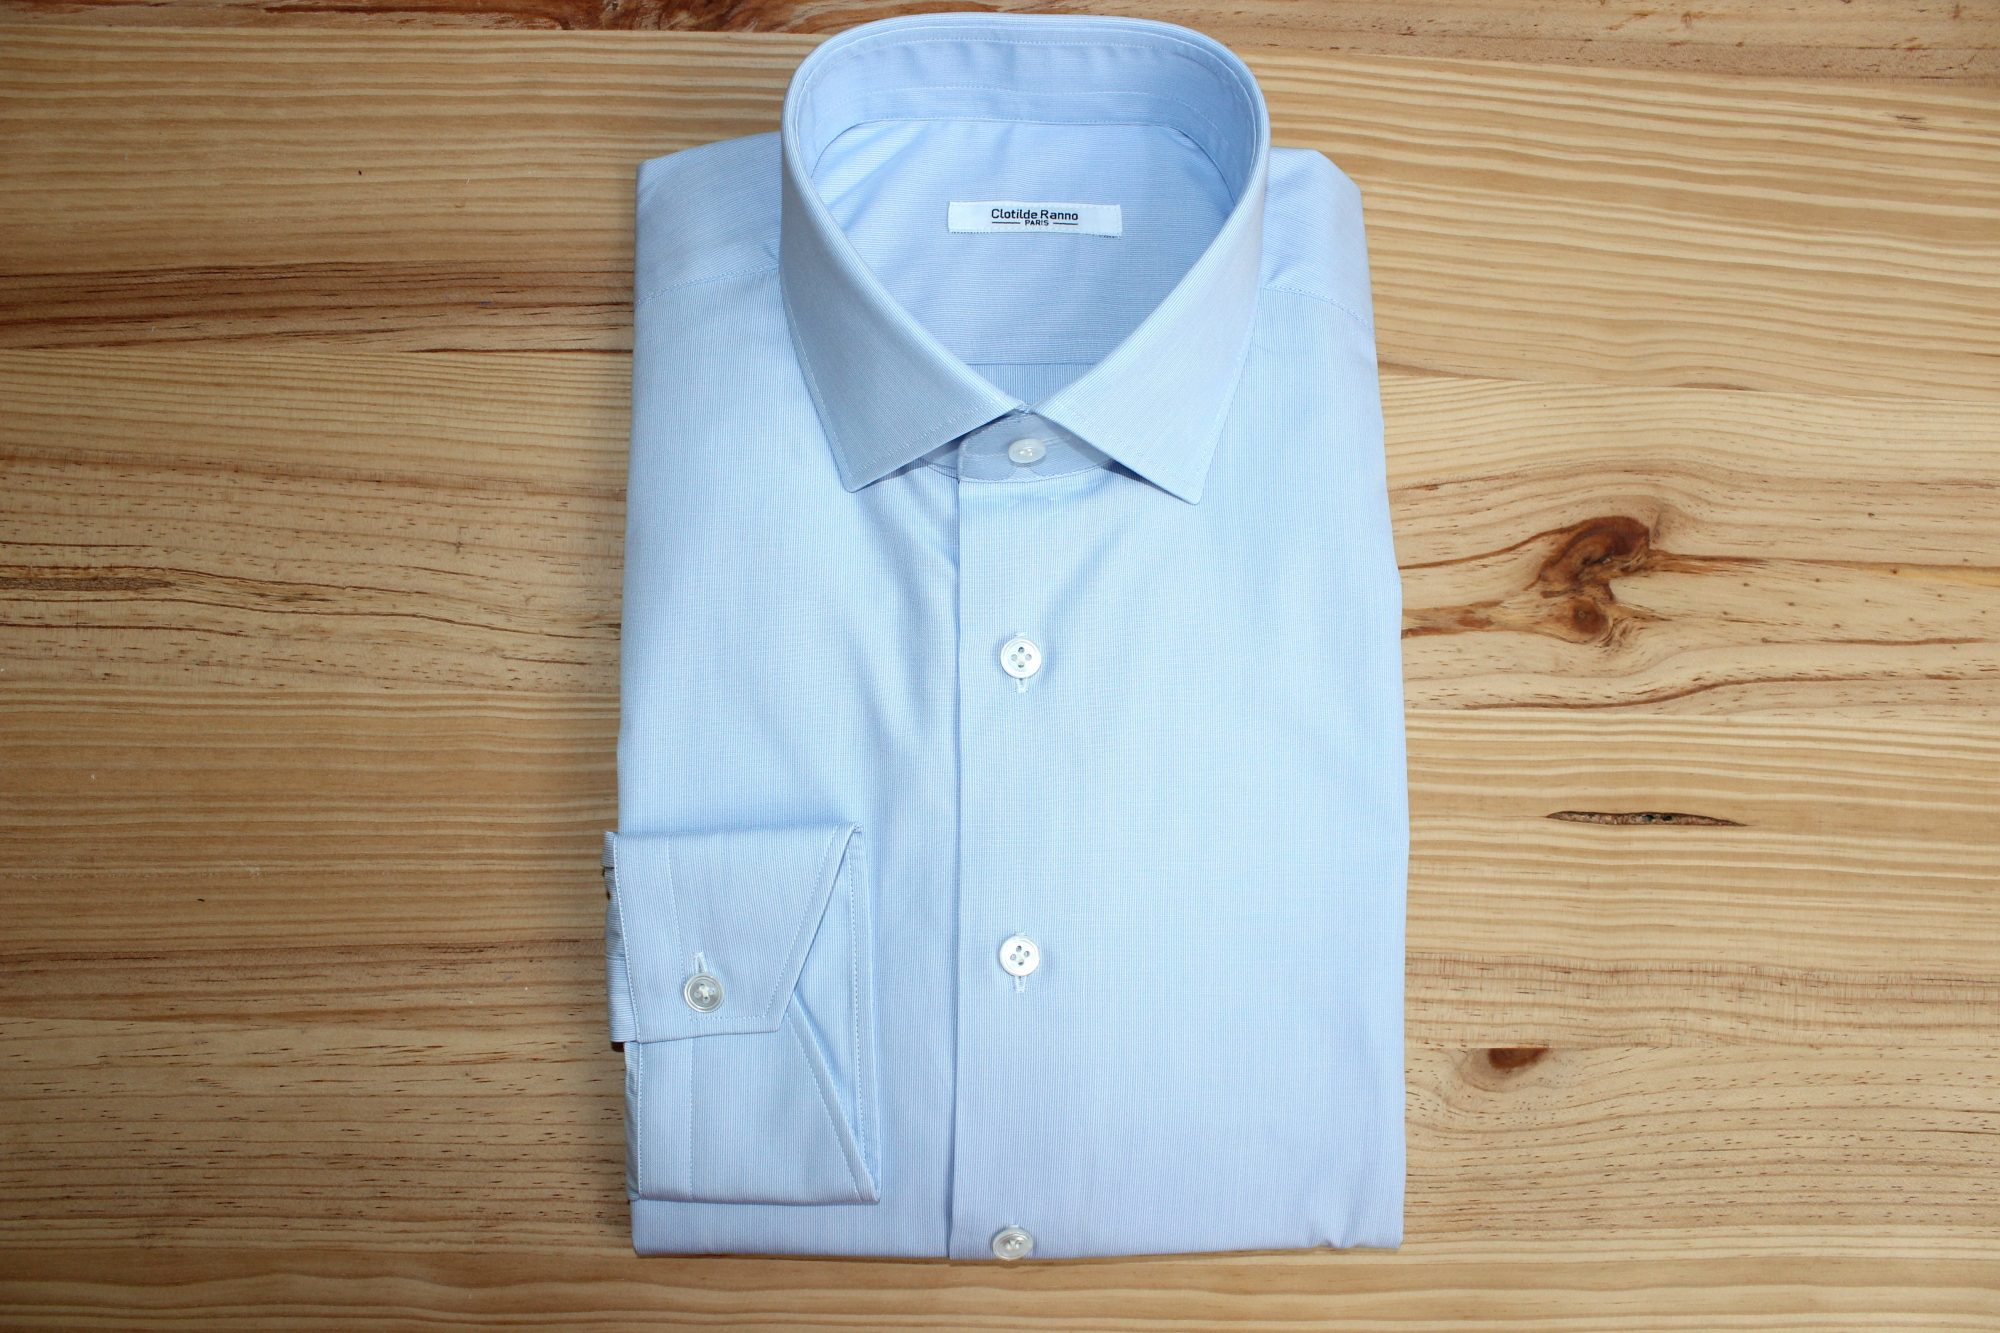 tunique chemise sur mesure , tunique chemise , chemise sur mesure , tunique sur mesure